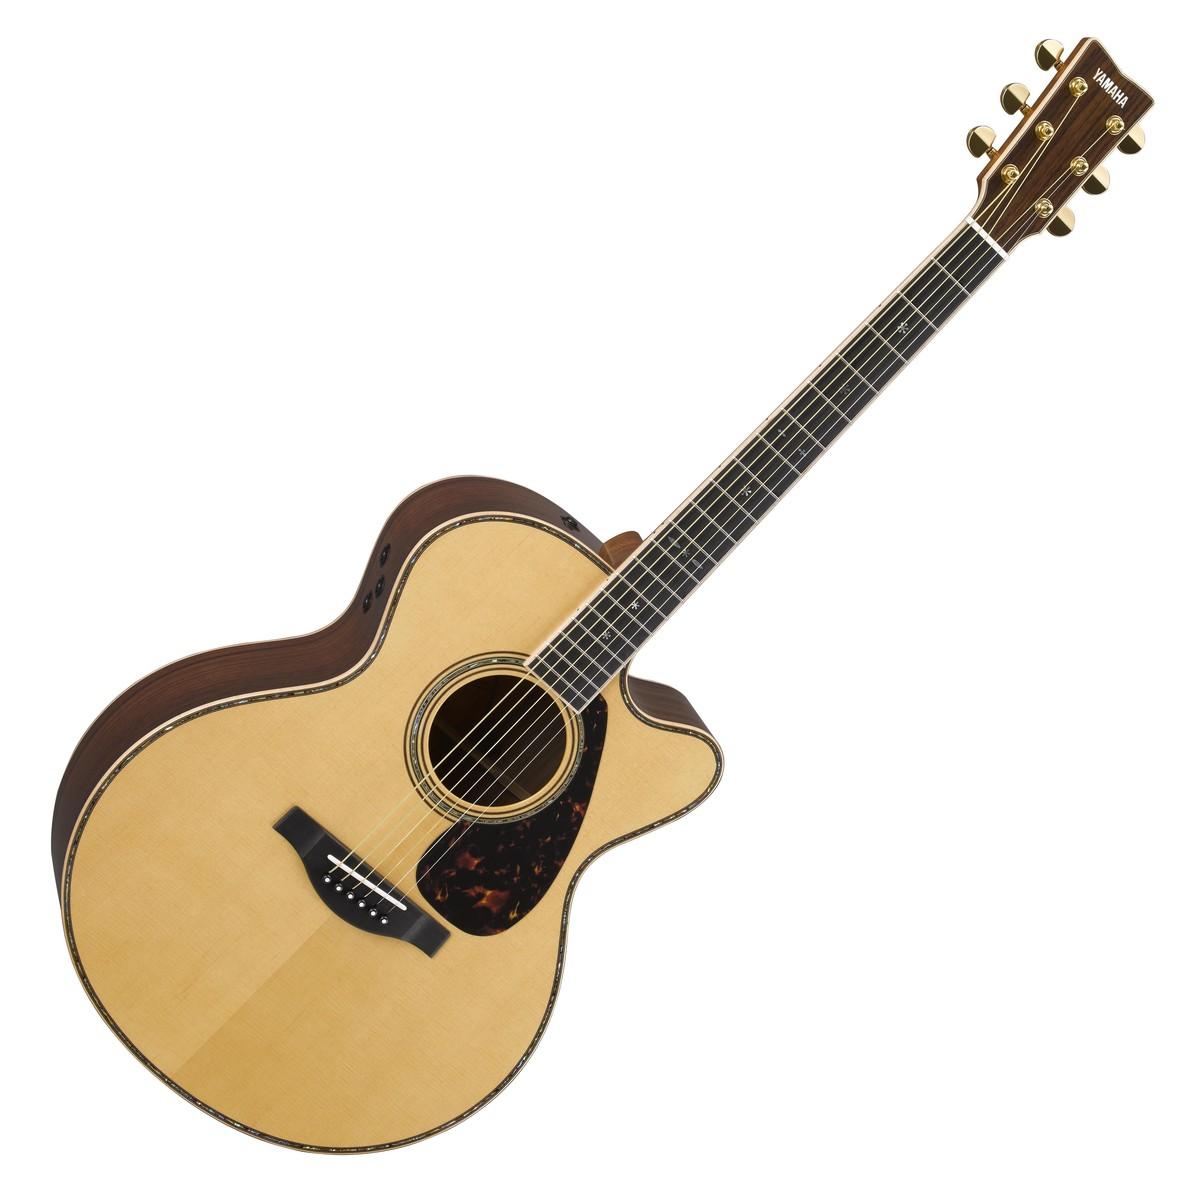 yamaha gljx36careii guitare electro acoustique brillant naturel. Black Bedroom Furniture Sets. Home Design Ideas